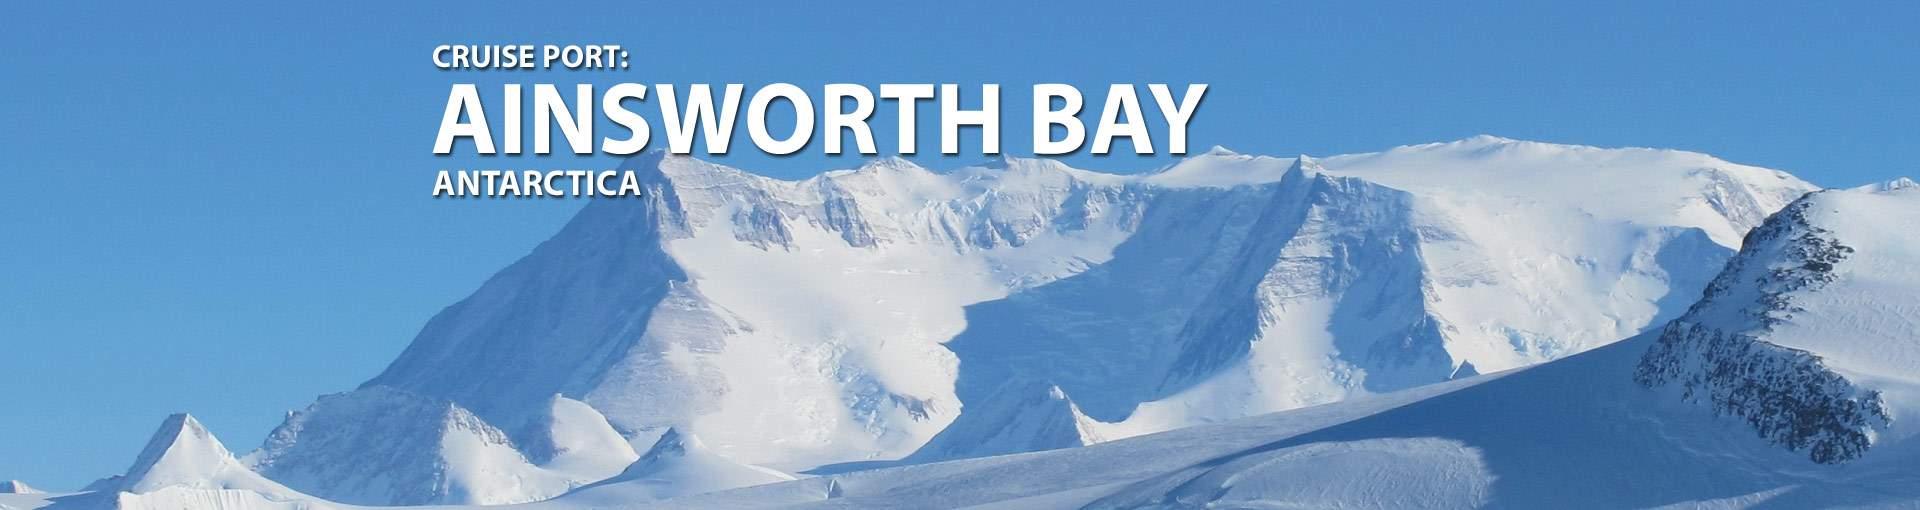 Ainsworth Bay, Antarctica Cruise Port